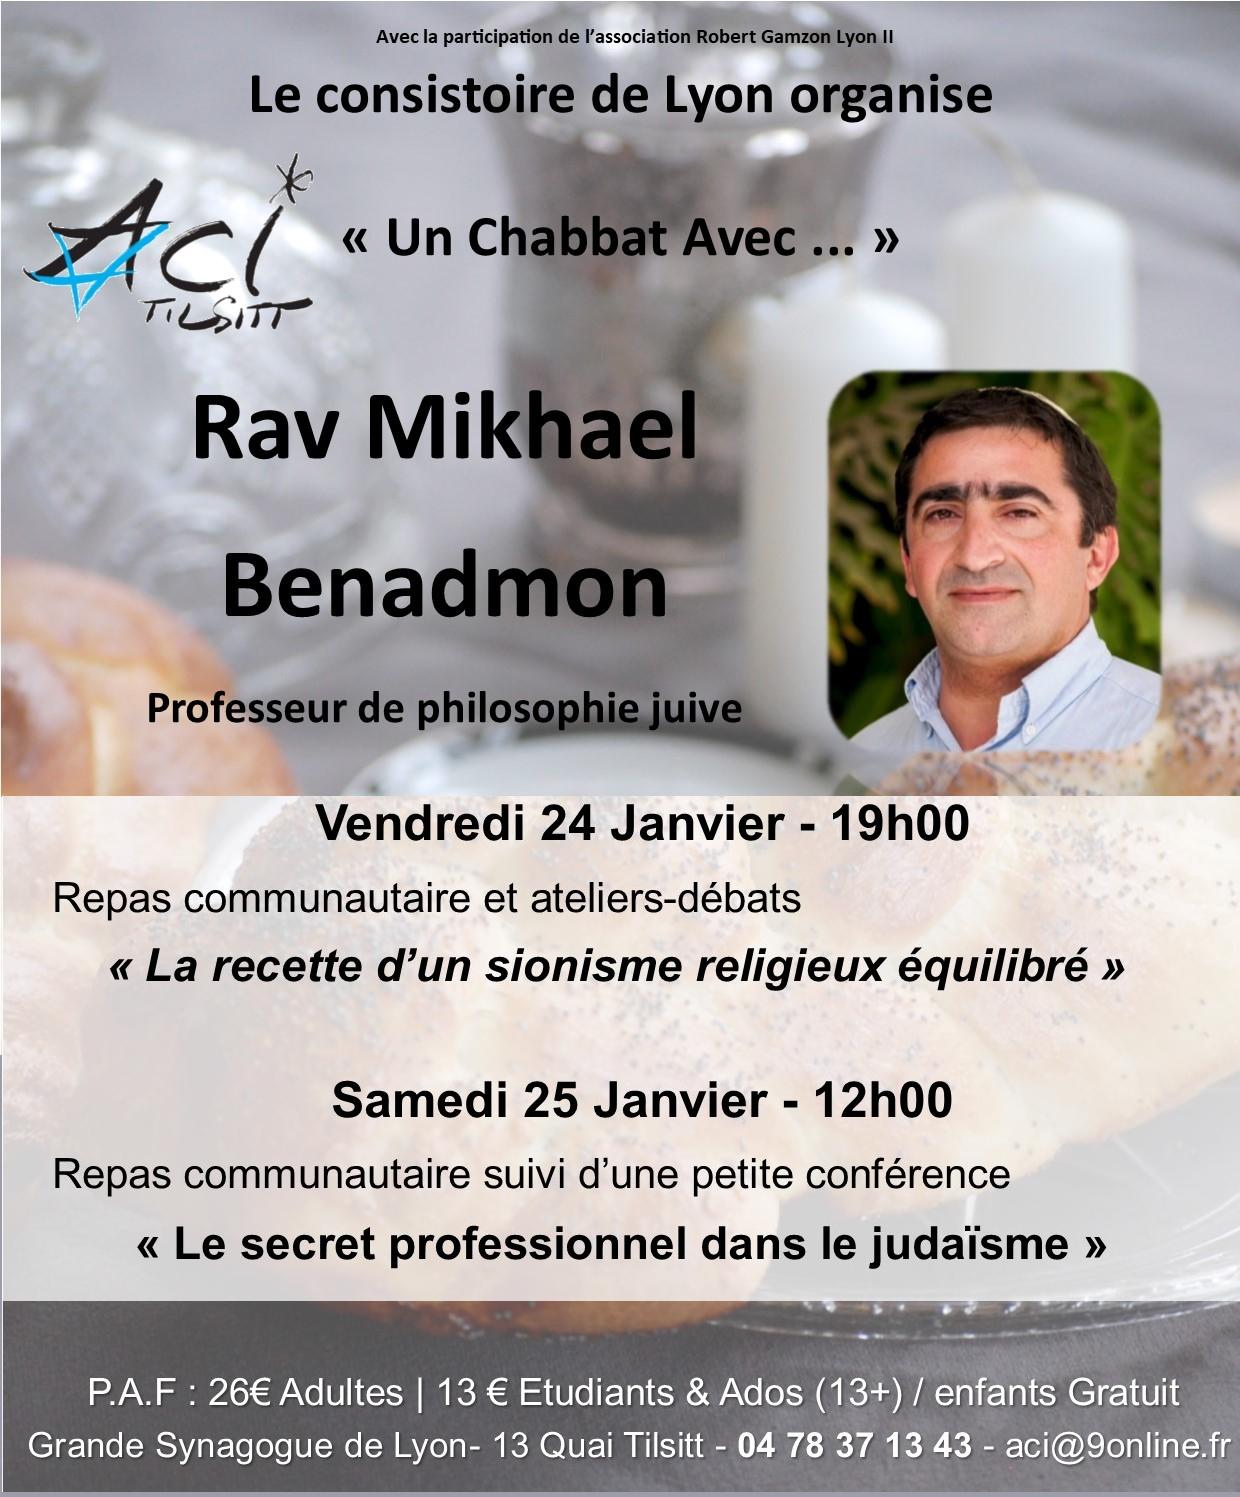 Chabbat plein, avec Mickael Benadmon